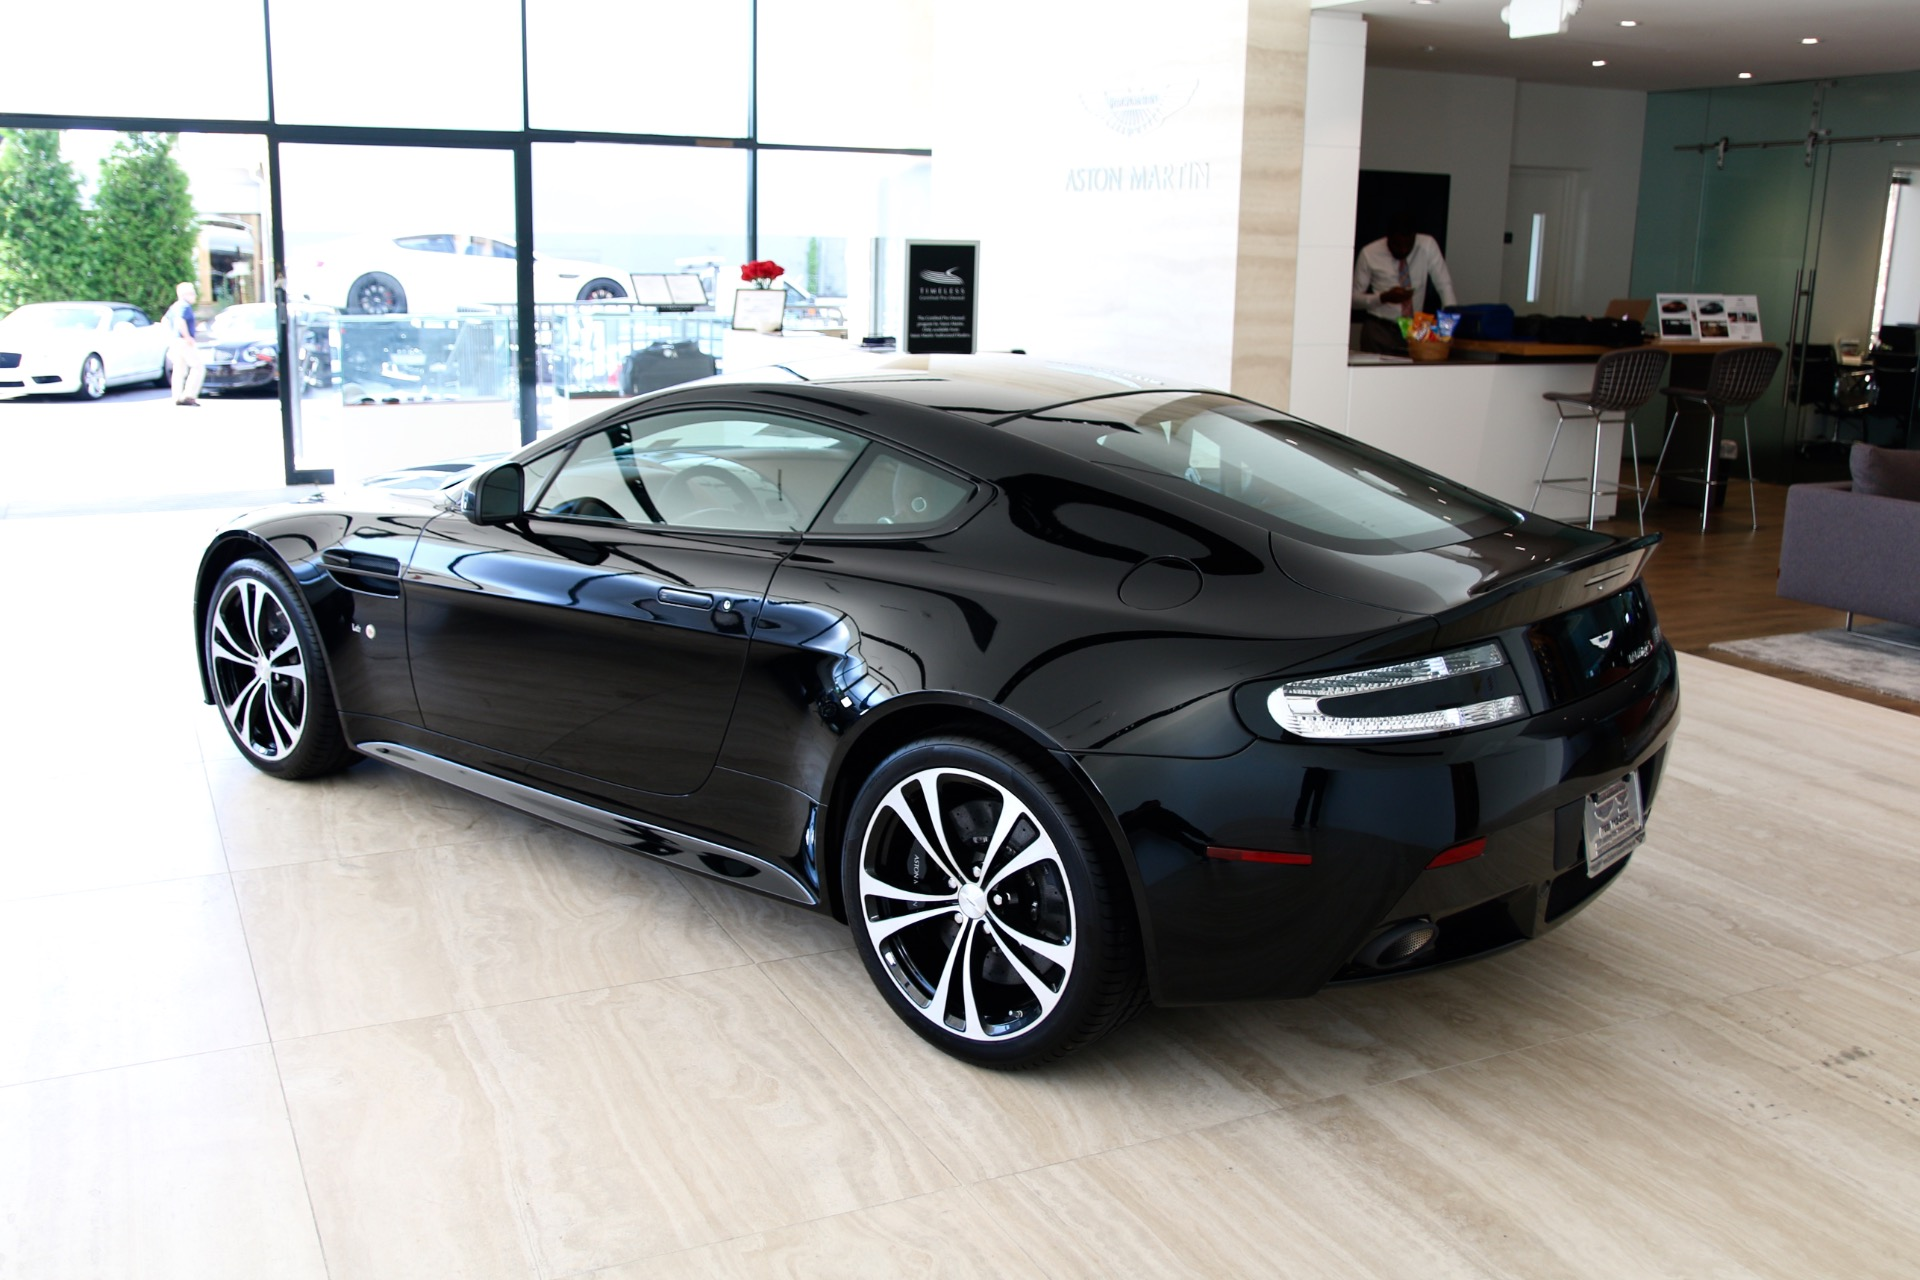 2017 Aston Martin V12 Vantage S Stock 7ns02763 For Sale Near Vienna Va Va Aston Martin Dealer